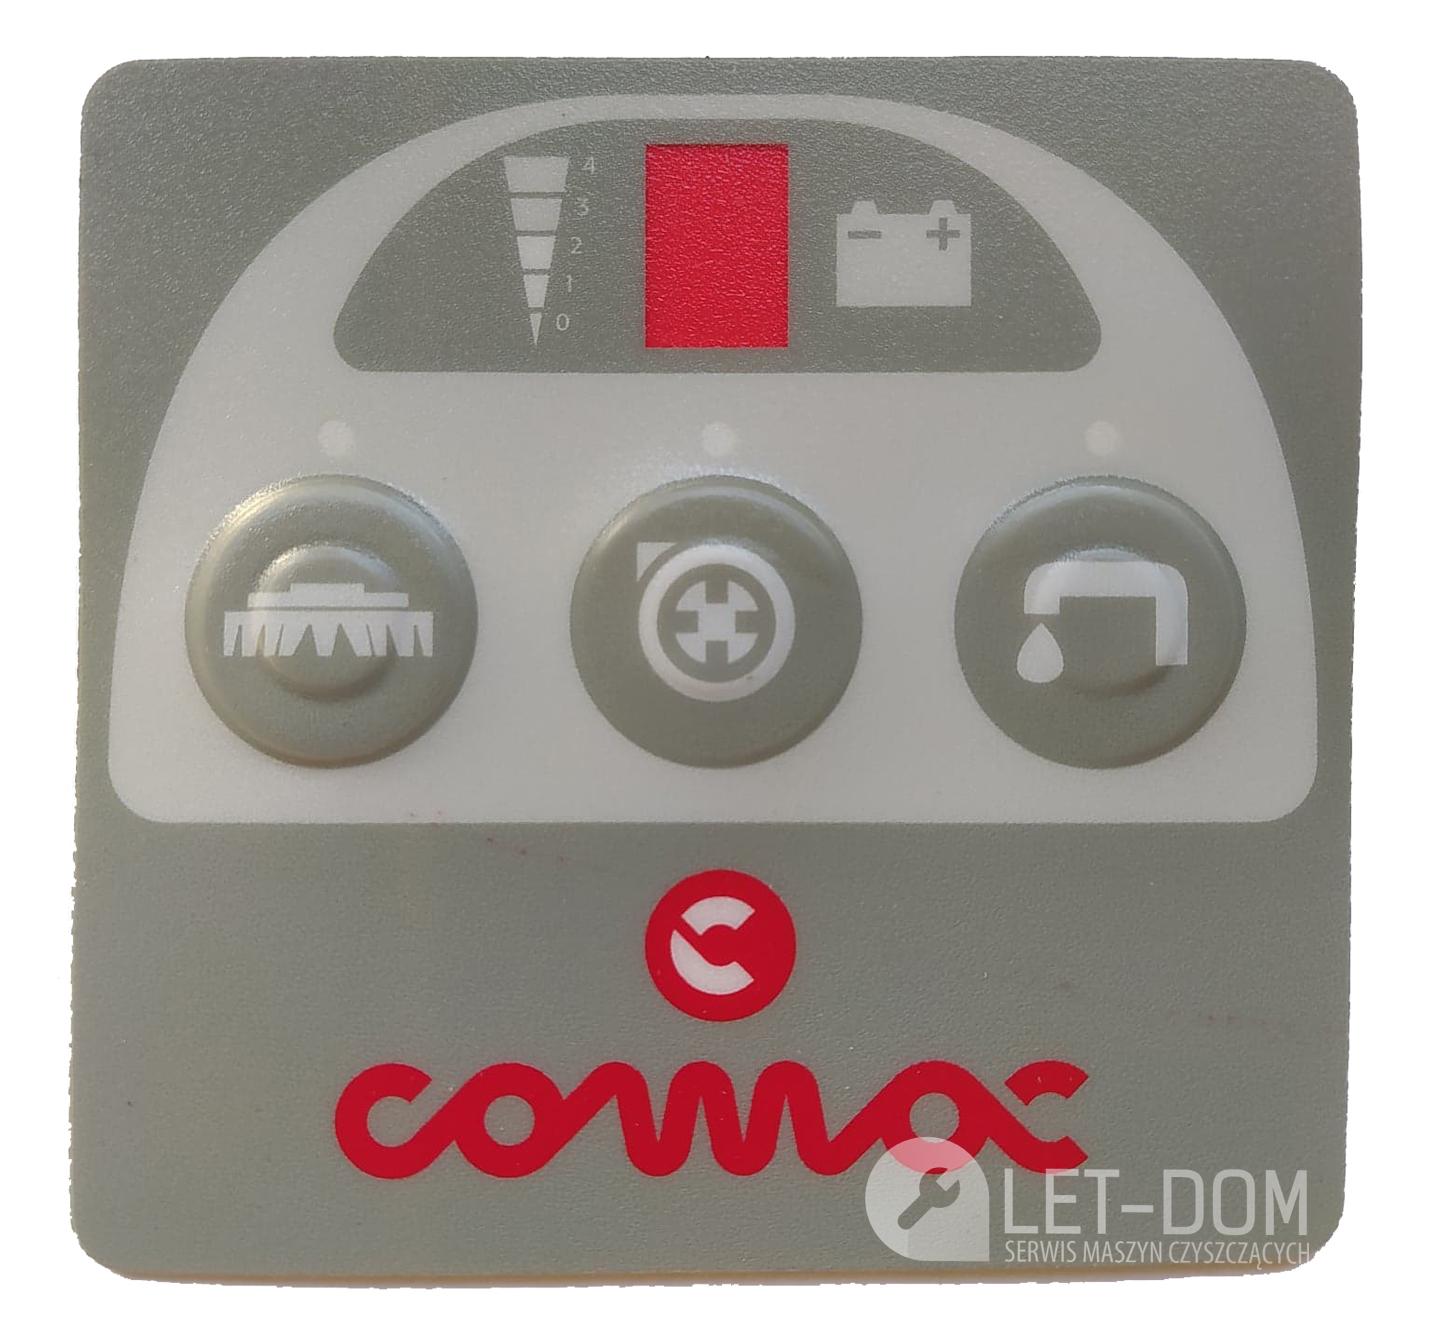 Naklejka panel sterowania Comac Vispa